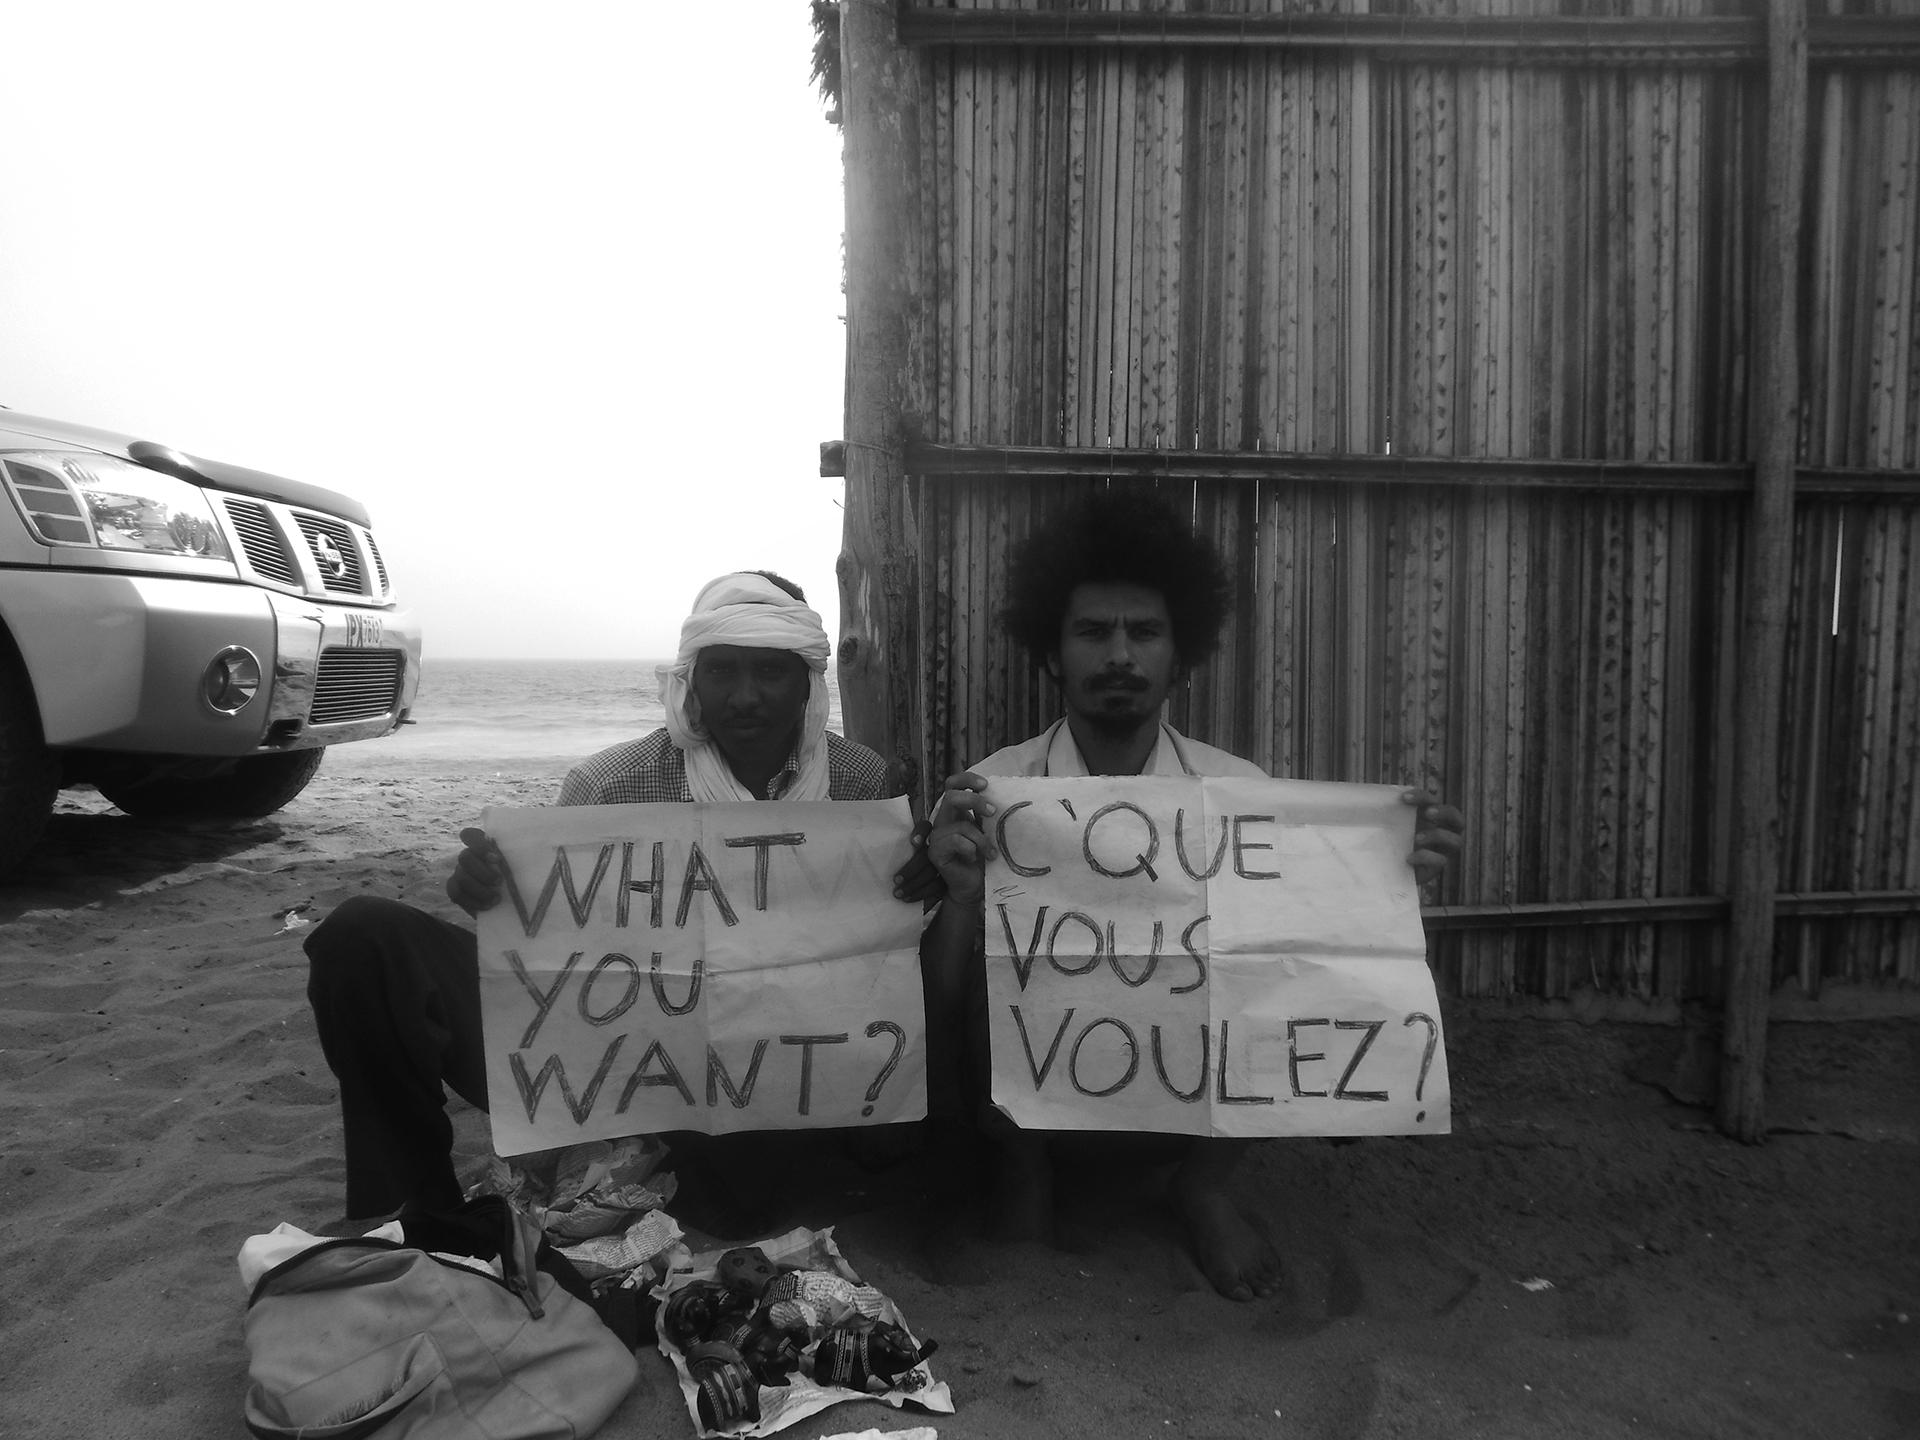 Paulo Nazareth, CA _ C` QUE VOUS VOULEZ ?, 2013. Cortesia do artista e Galeria Mendes Wood DM